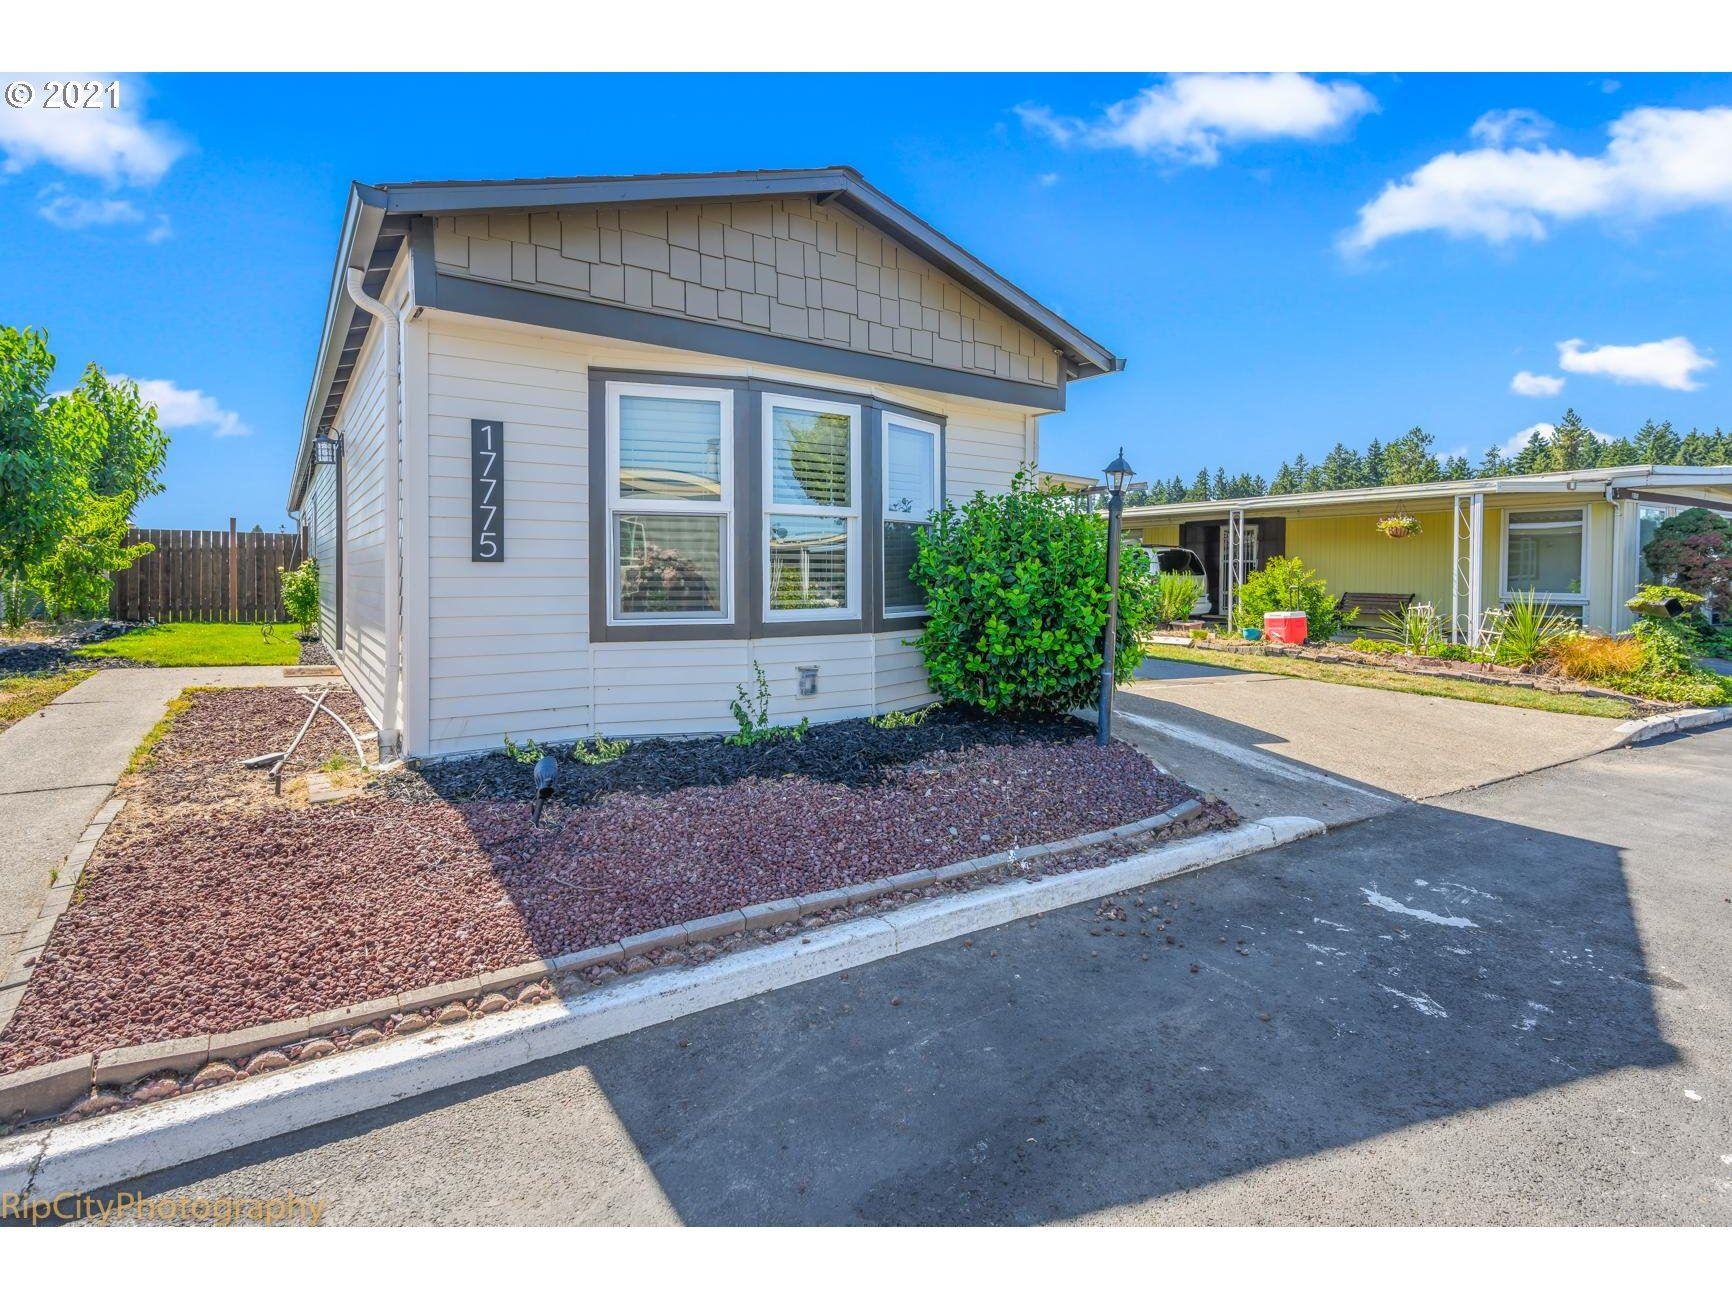 17775 SW MIDDLESEX WAY, Beaverton, OR 97006 - MLS#: 21045983